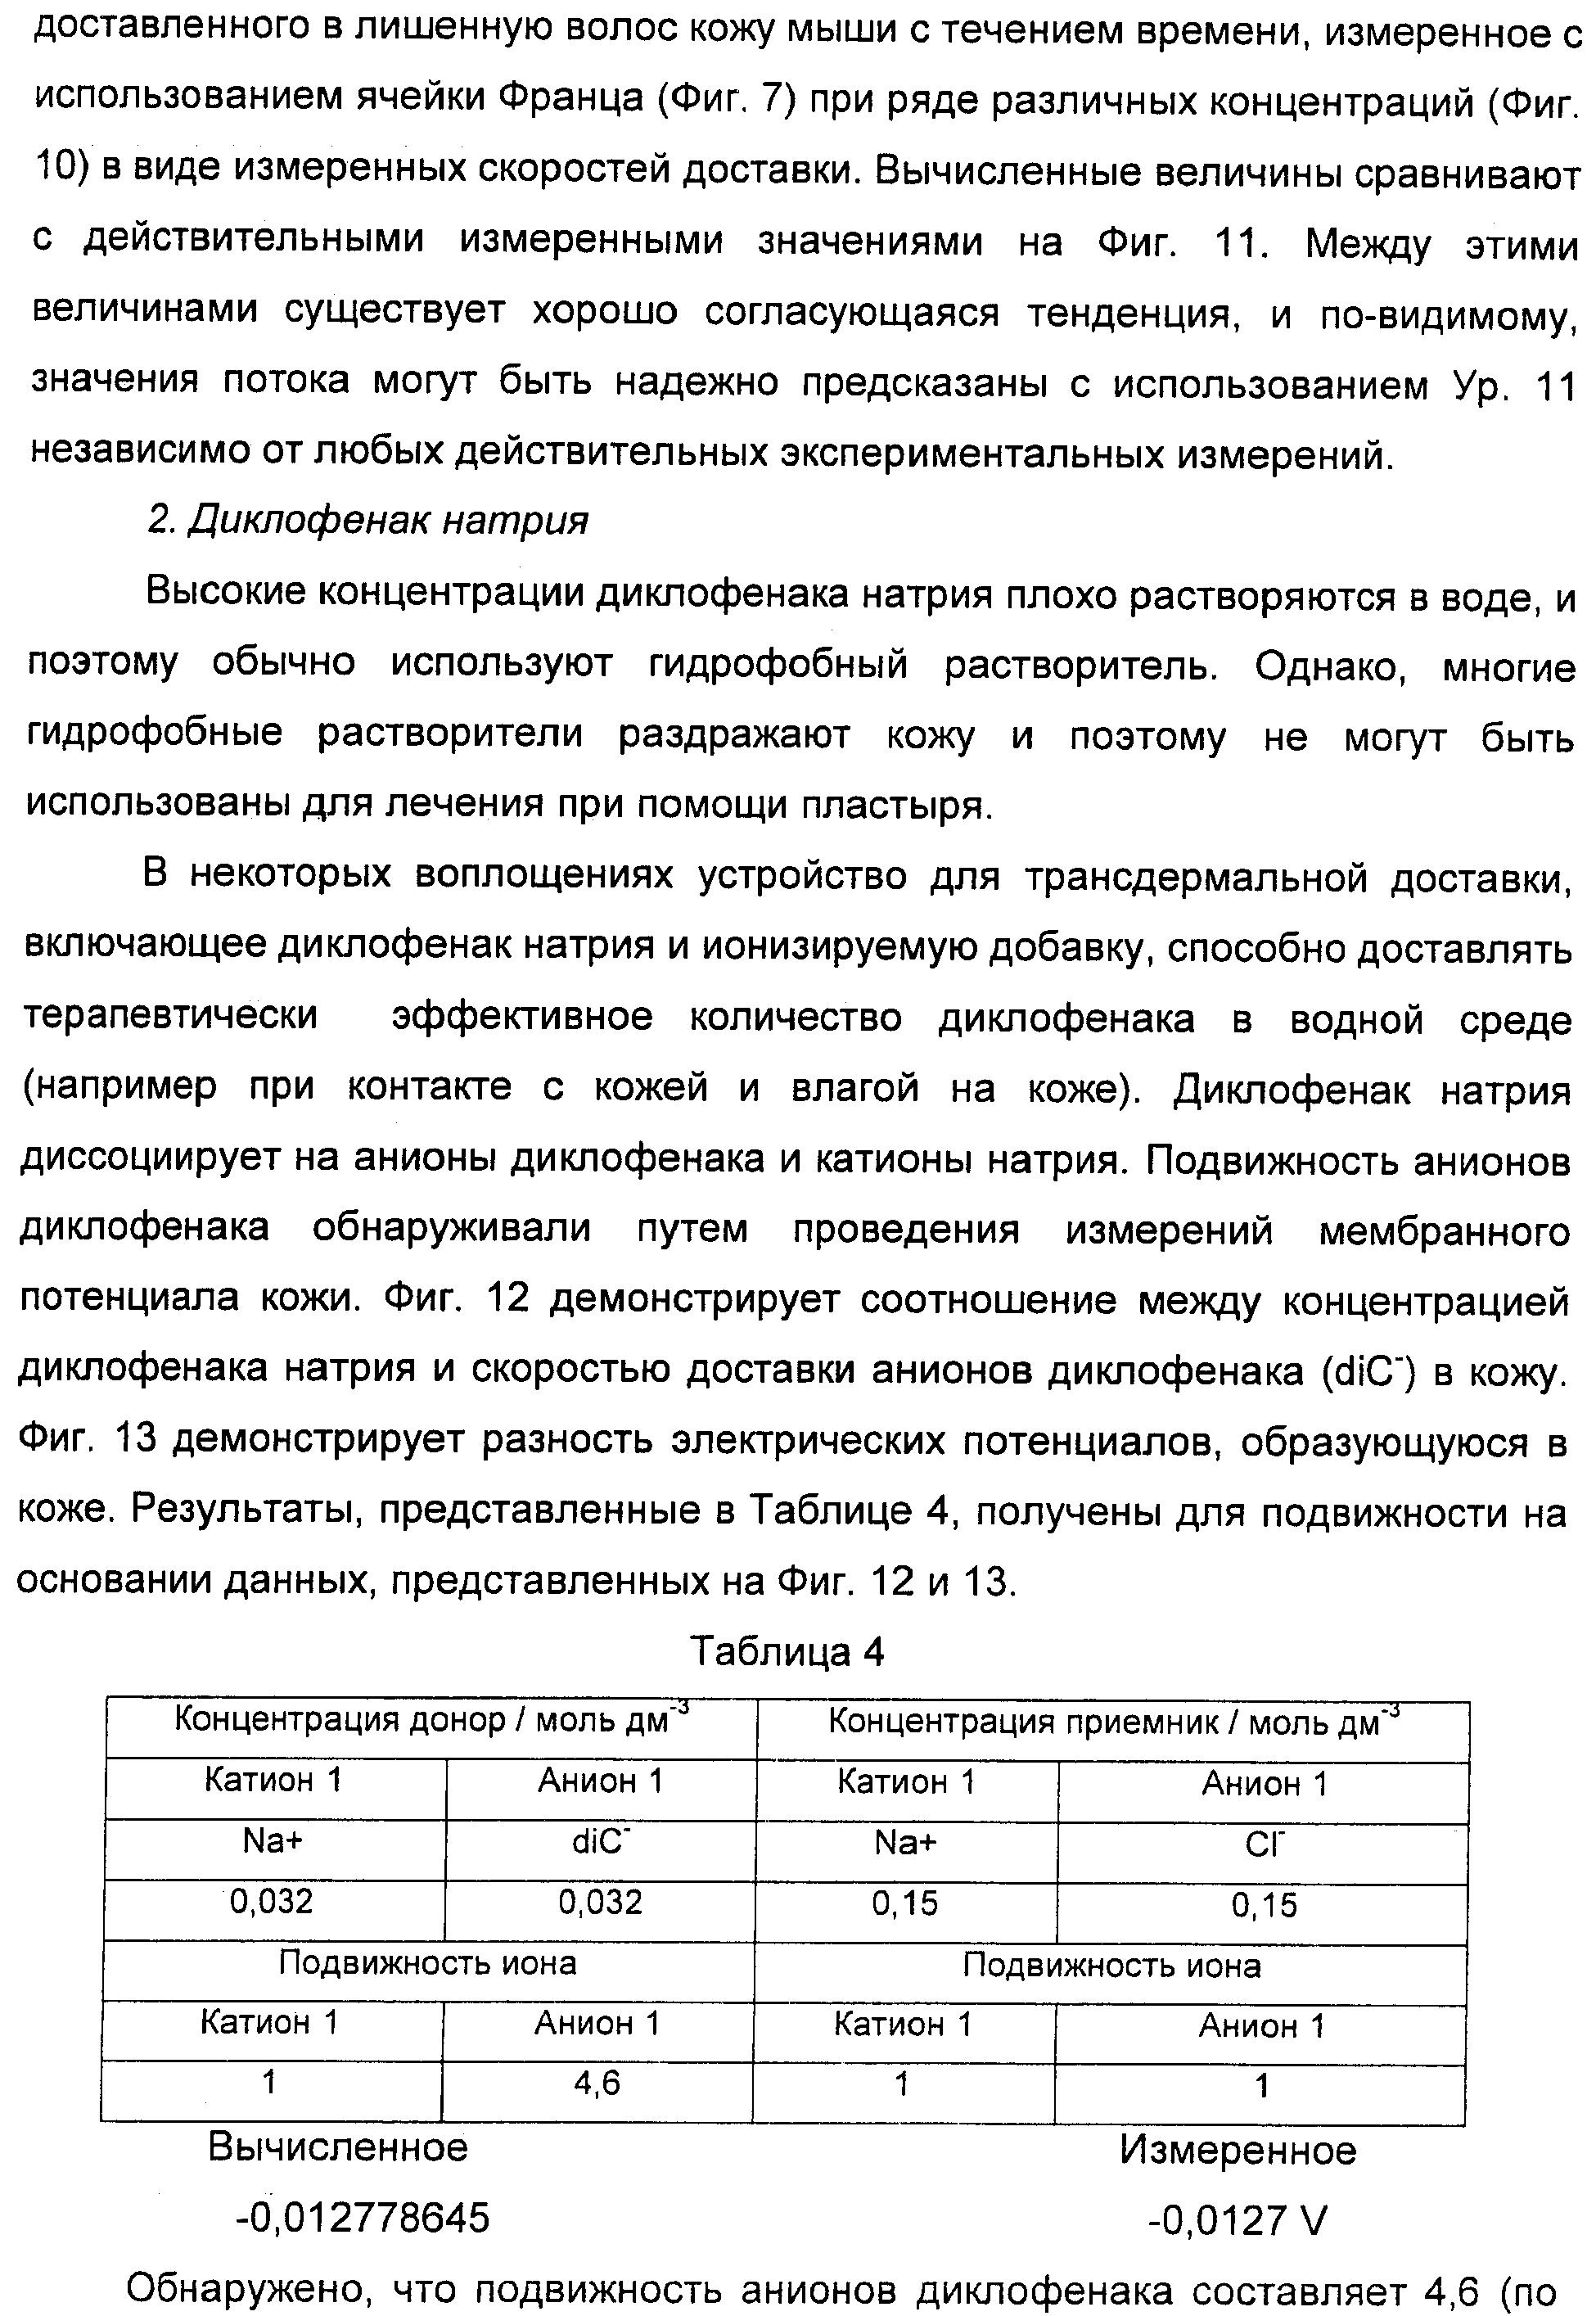 Figure 00000030